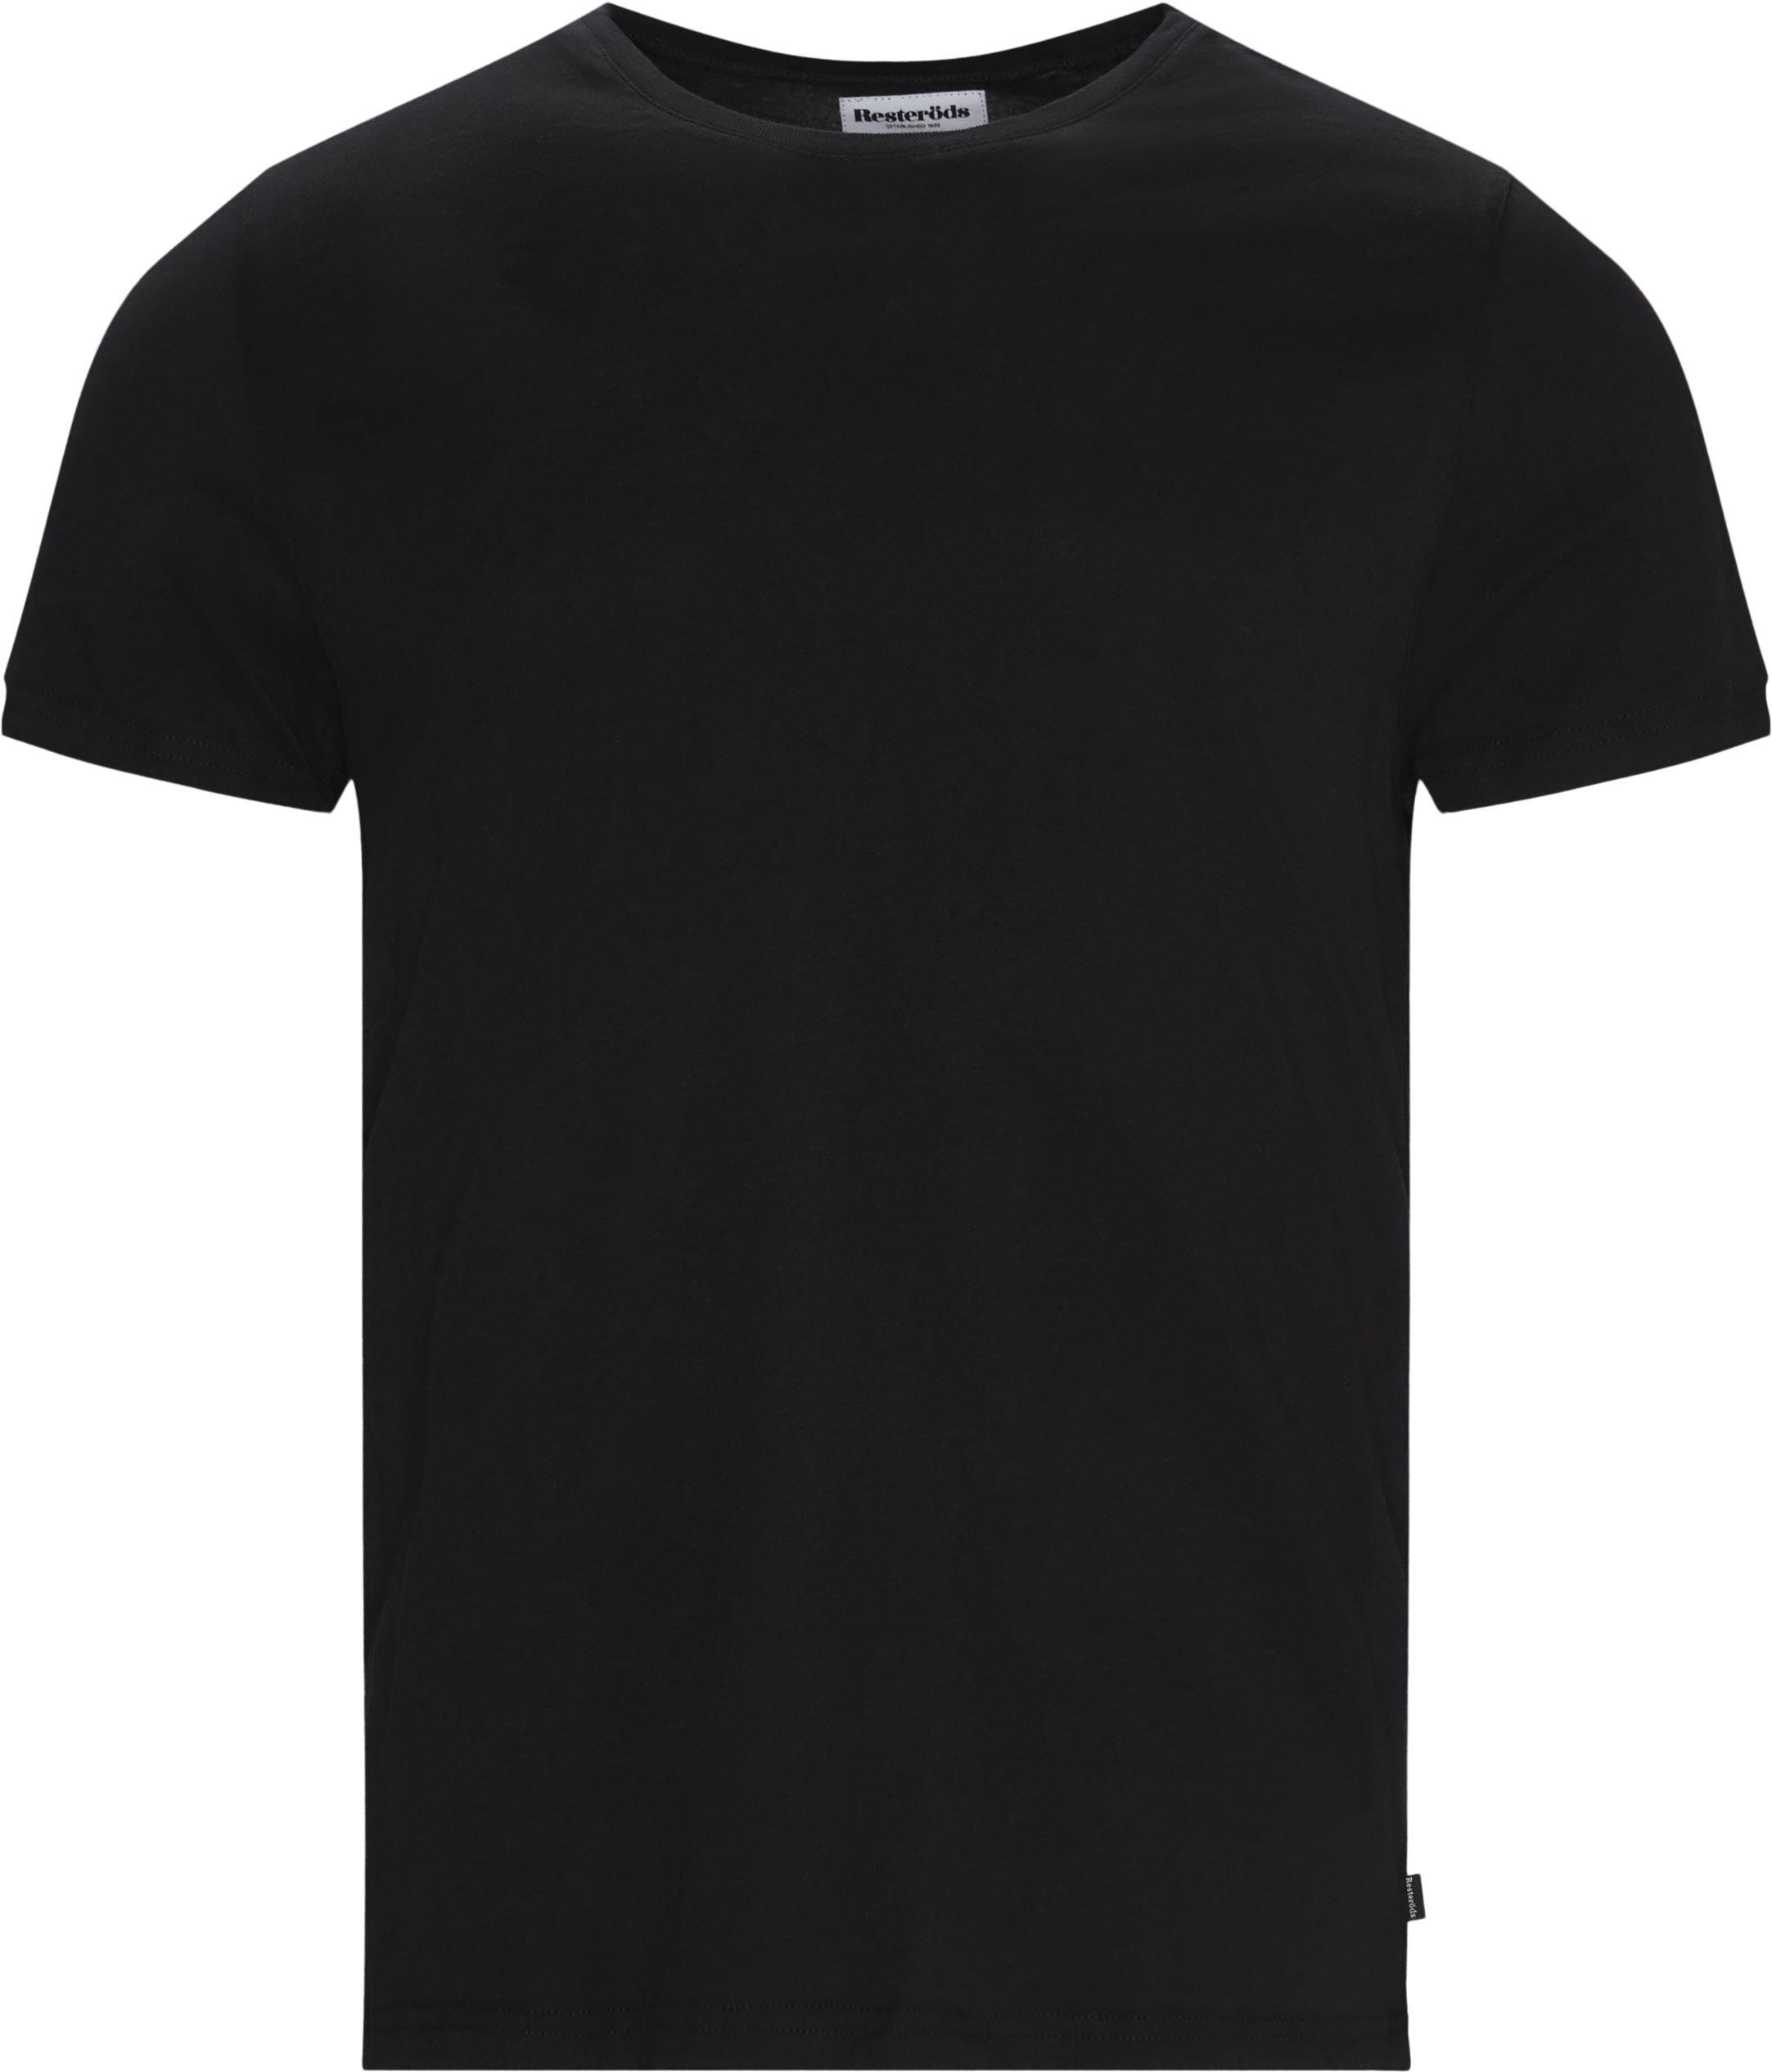 O-Neck Tee - T-shirts - Regular - Svart